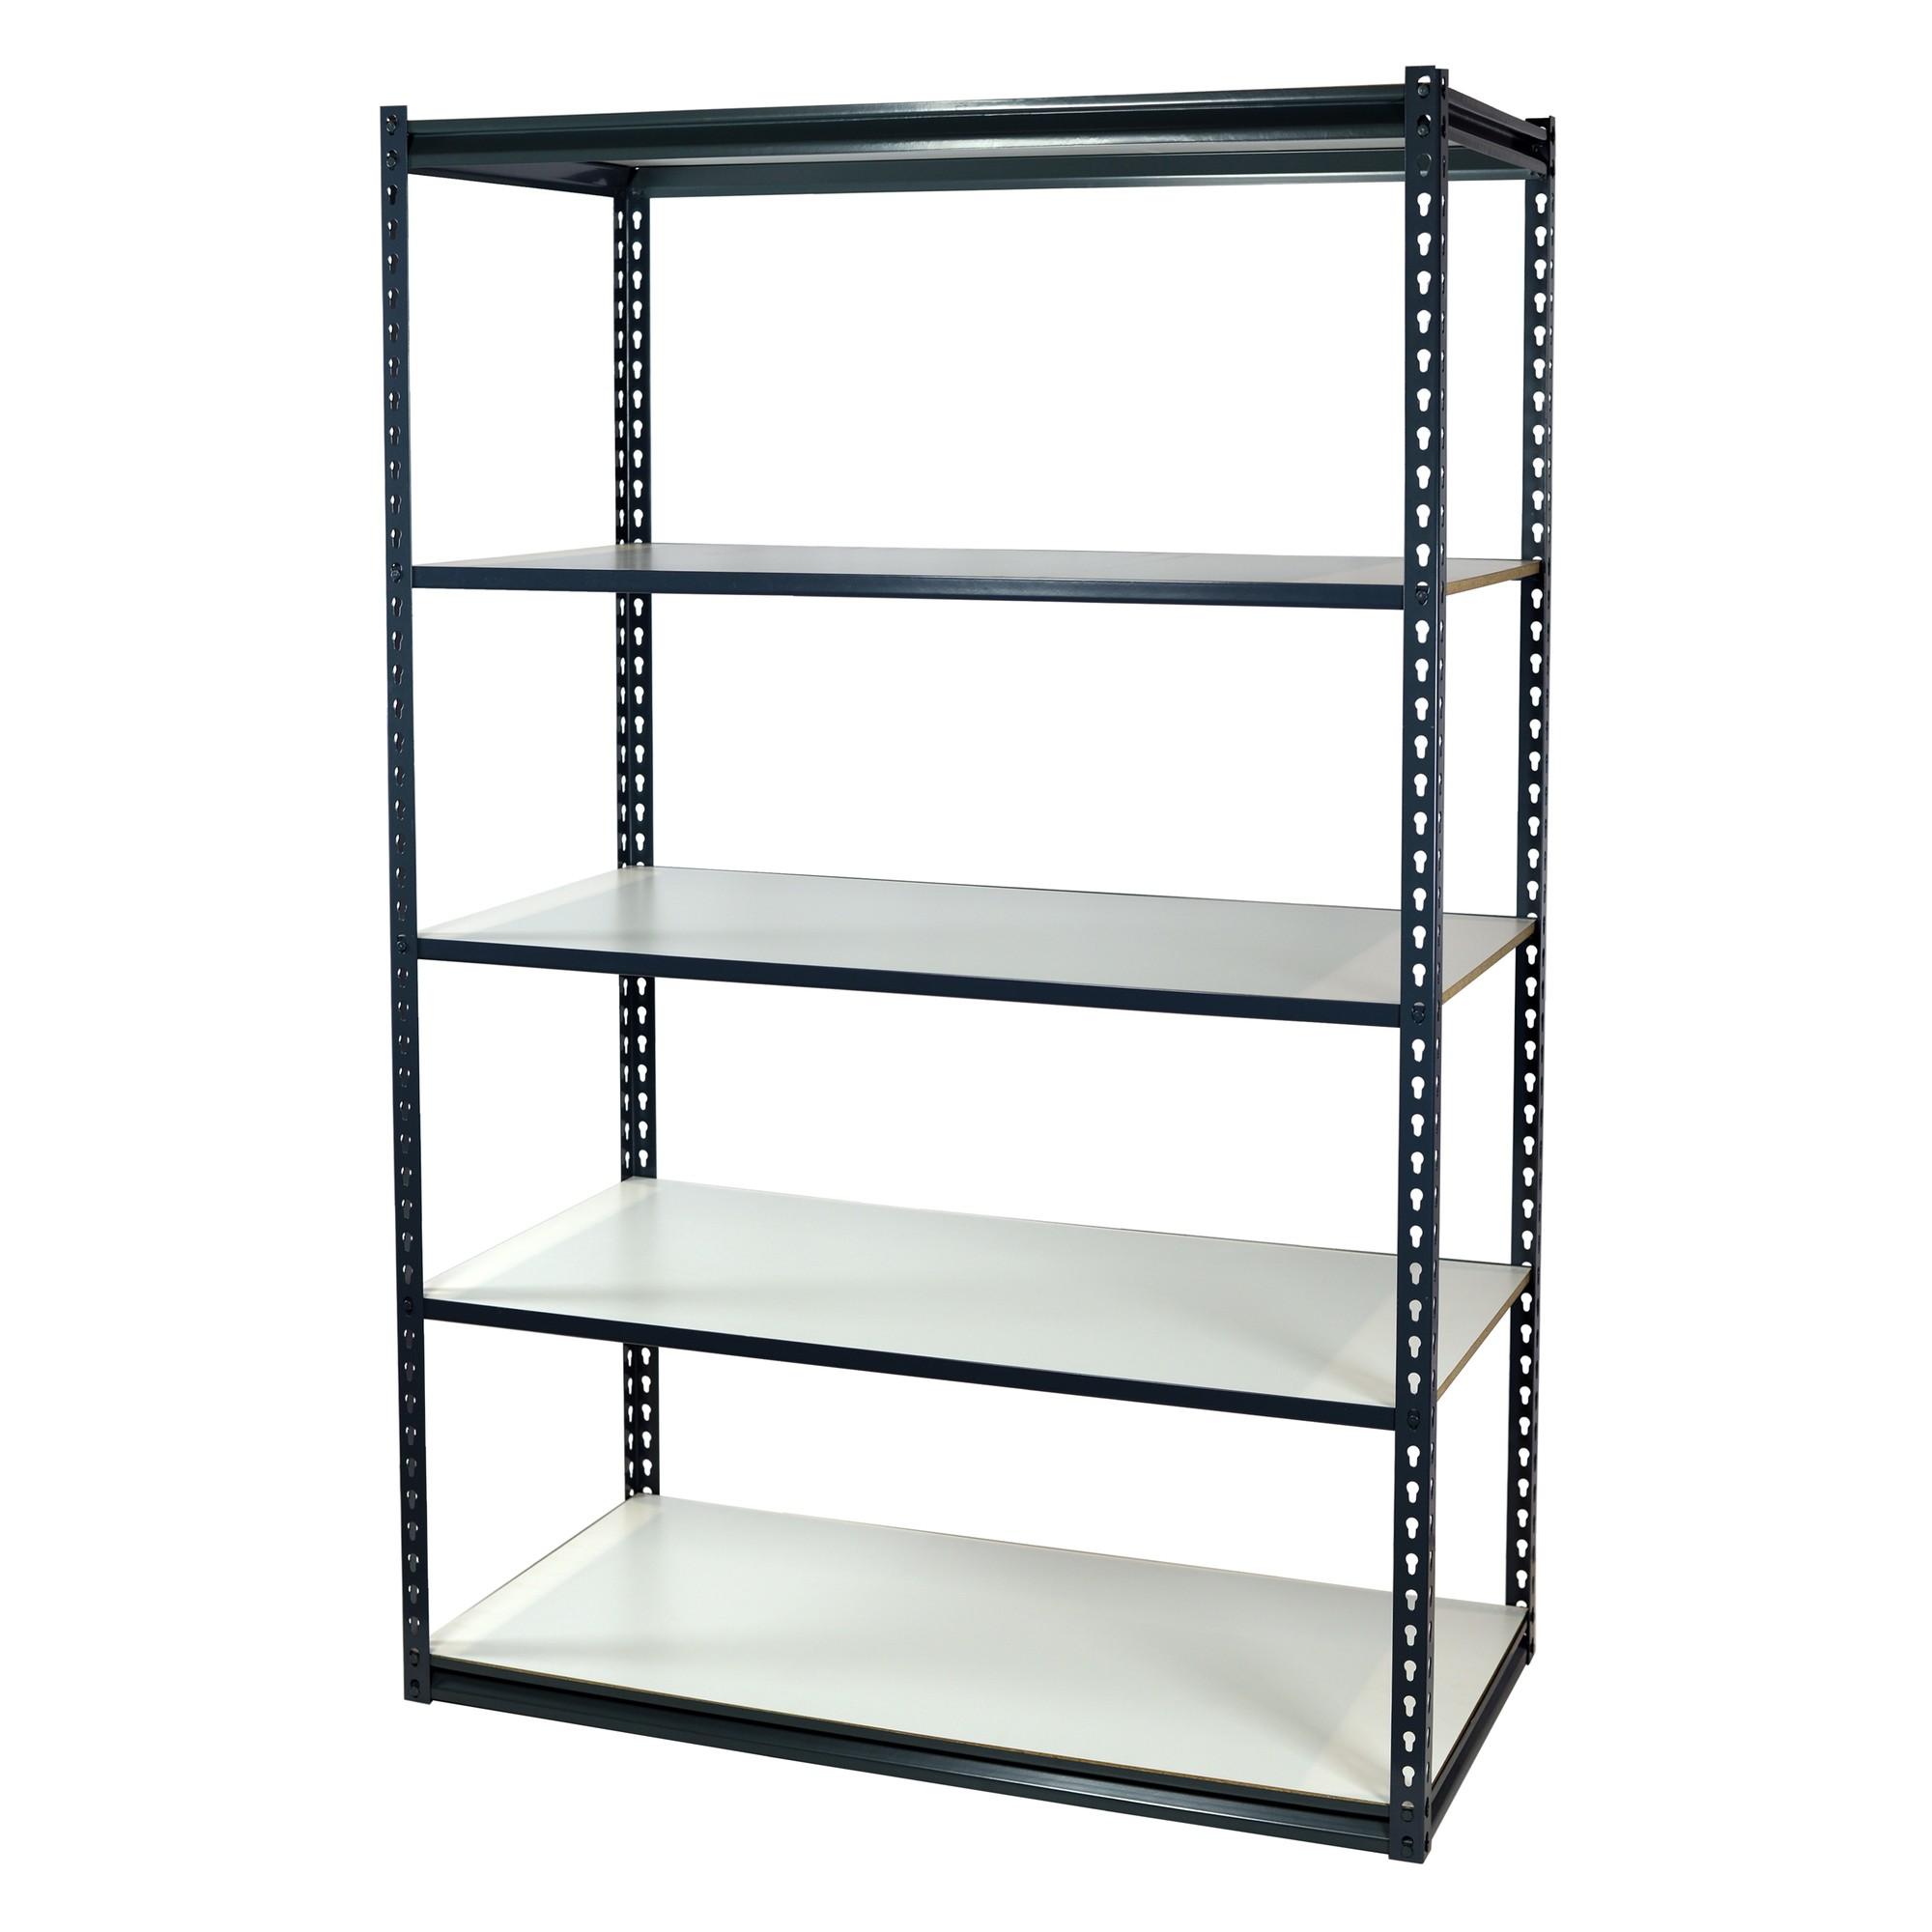 Storage Max Garage Shelving Boltless, 48 x 12 x 72, Low Profile, 5 Shelves